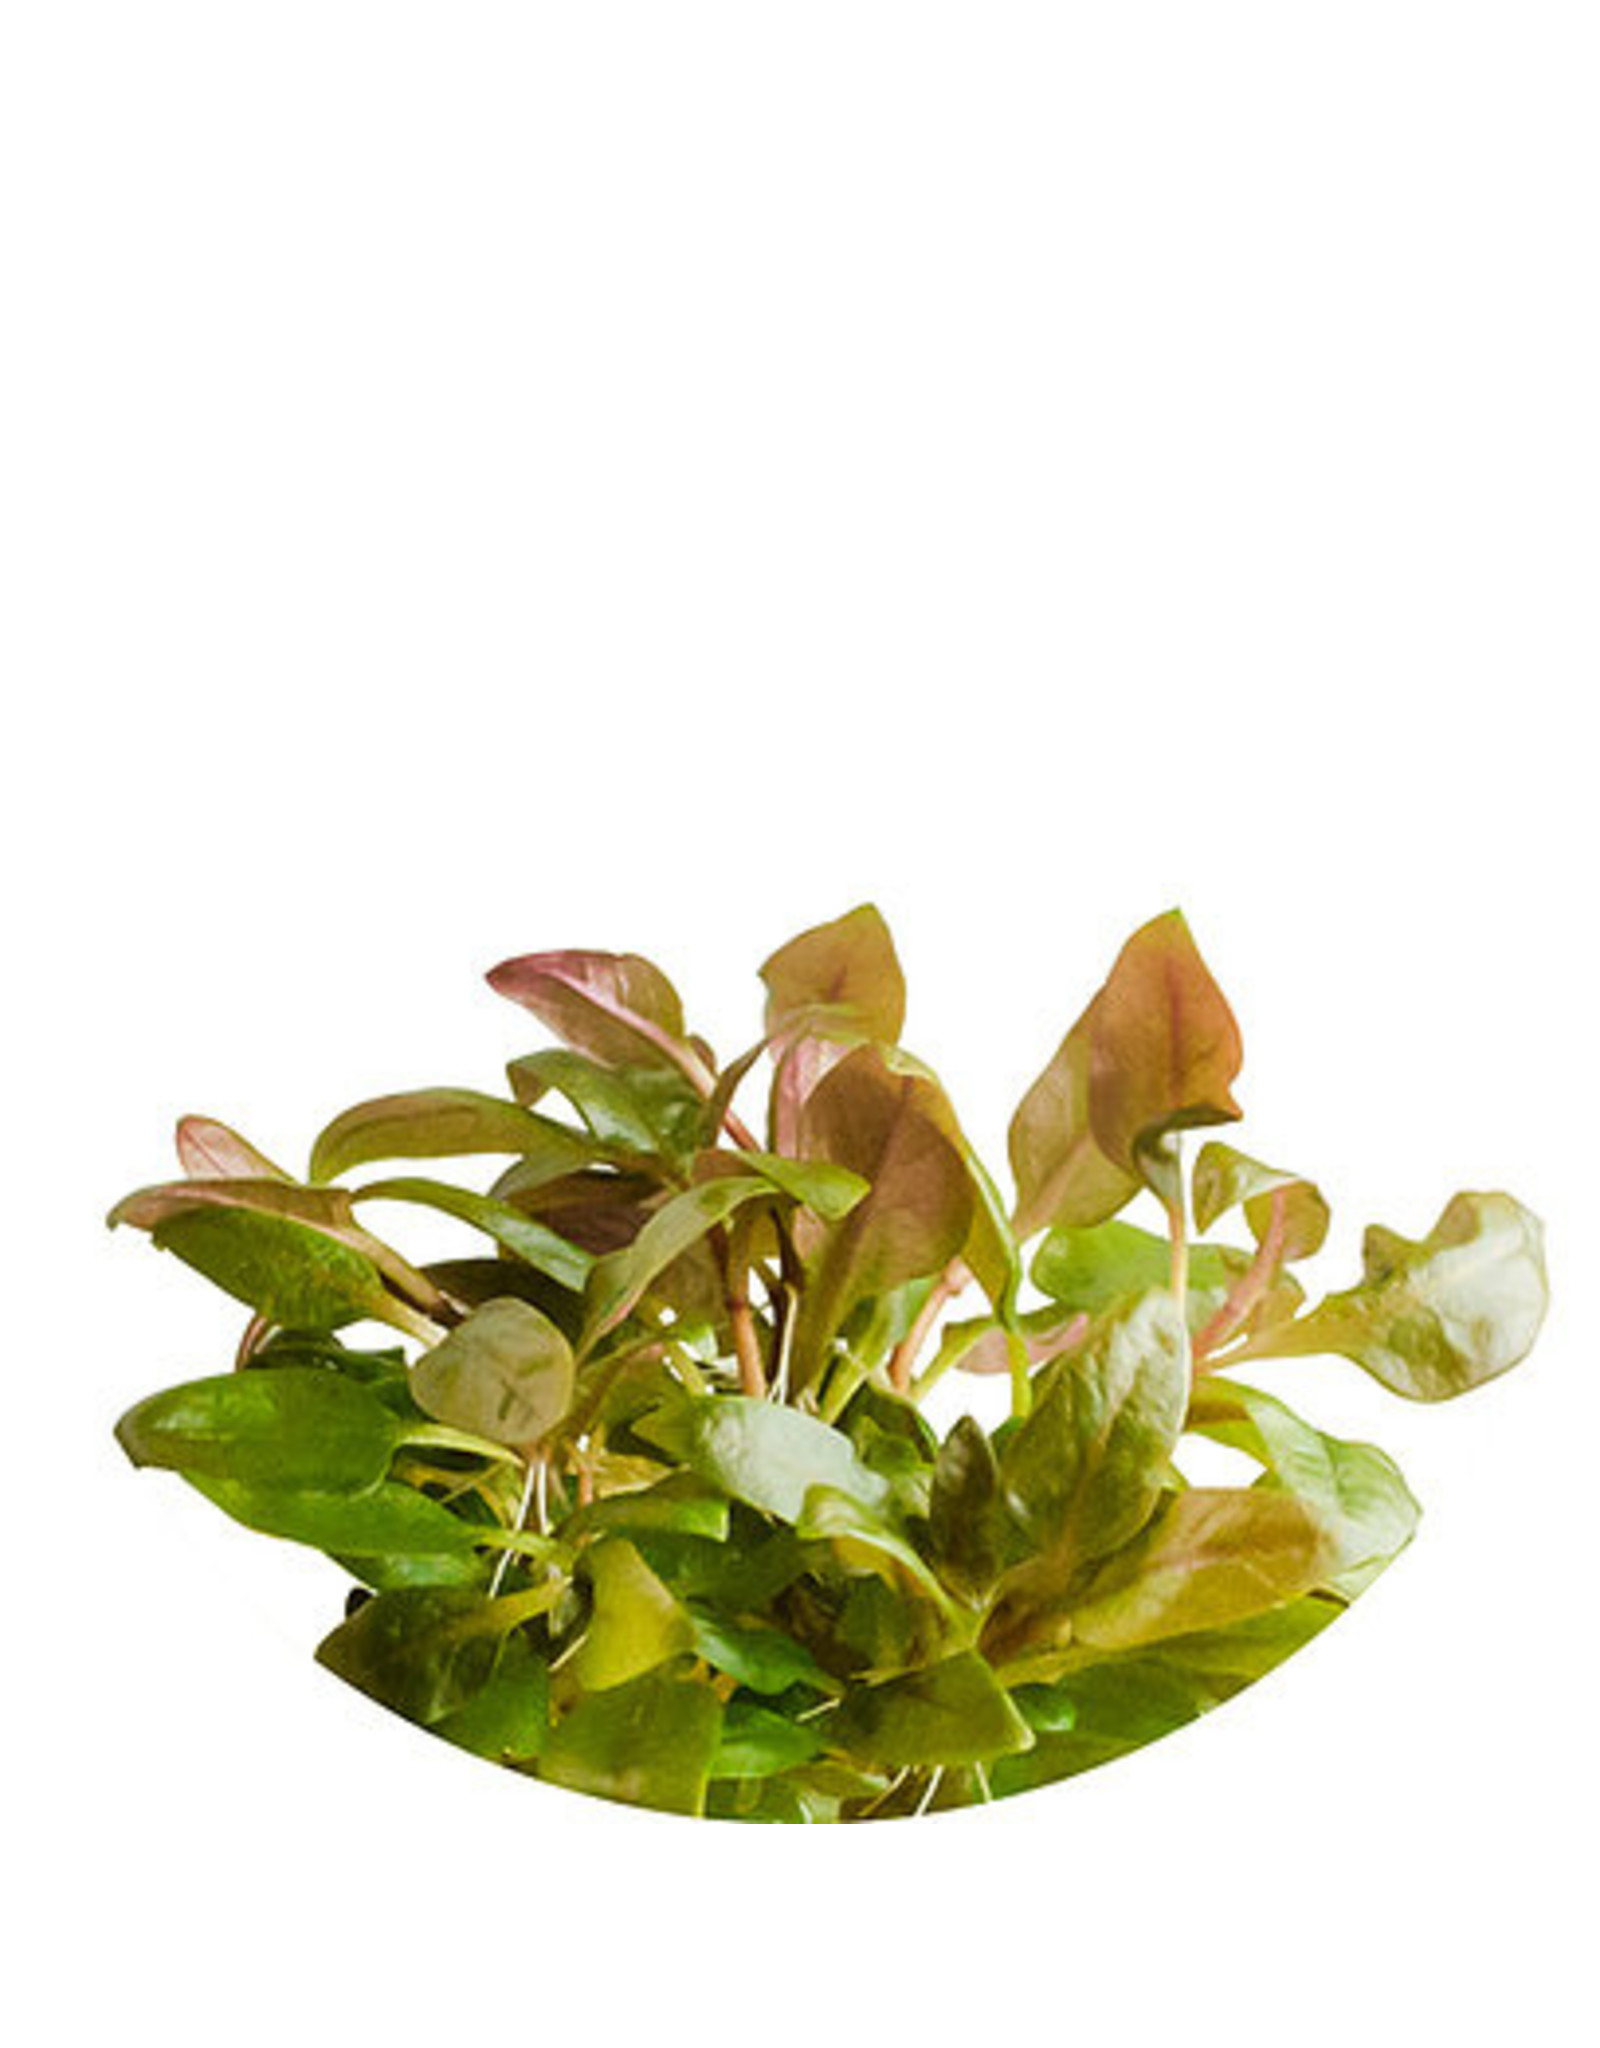 ABC Plants ABC PLANTS - Althernanthera reineckii var. Lilacina